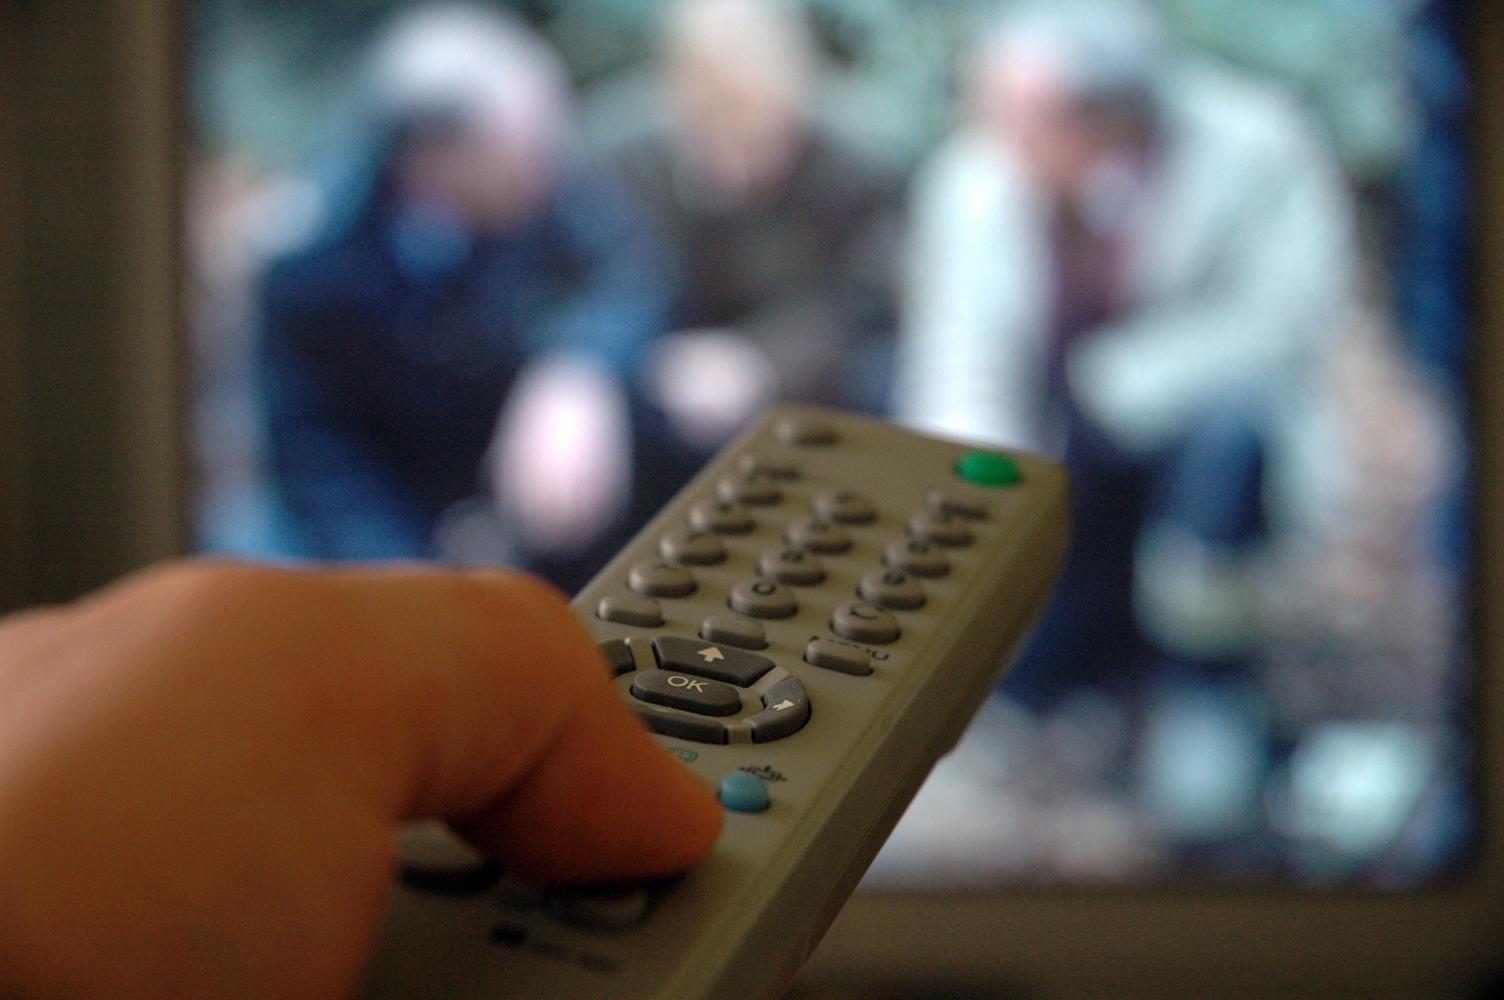 tv remote hand